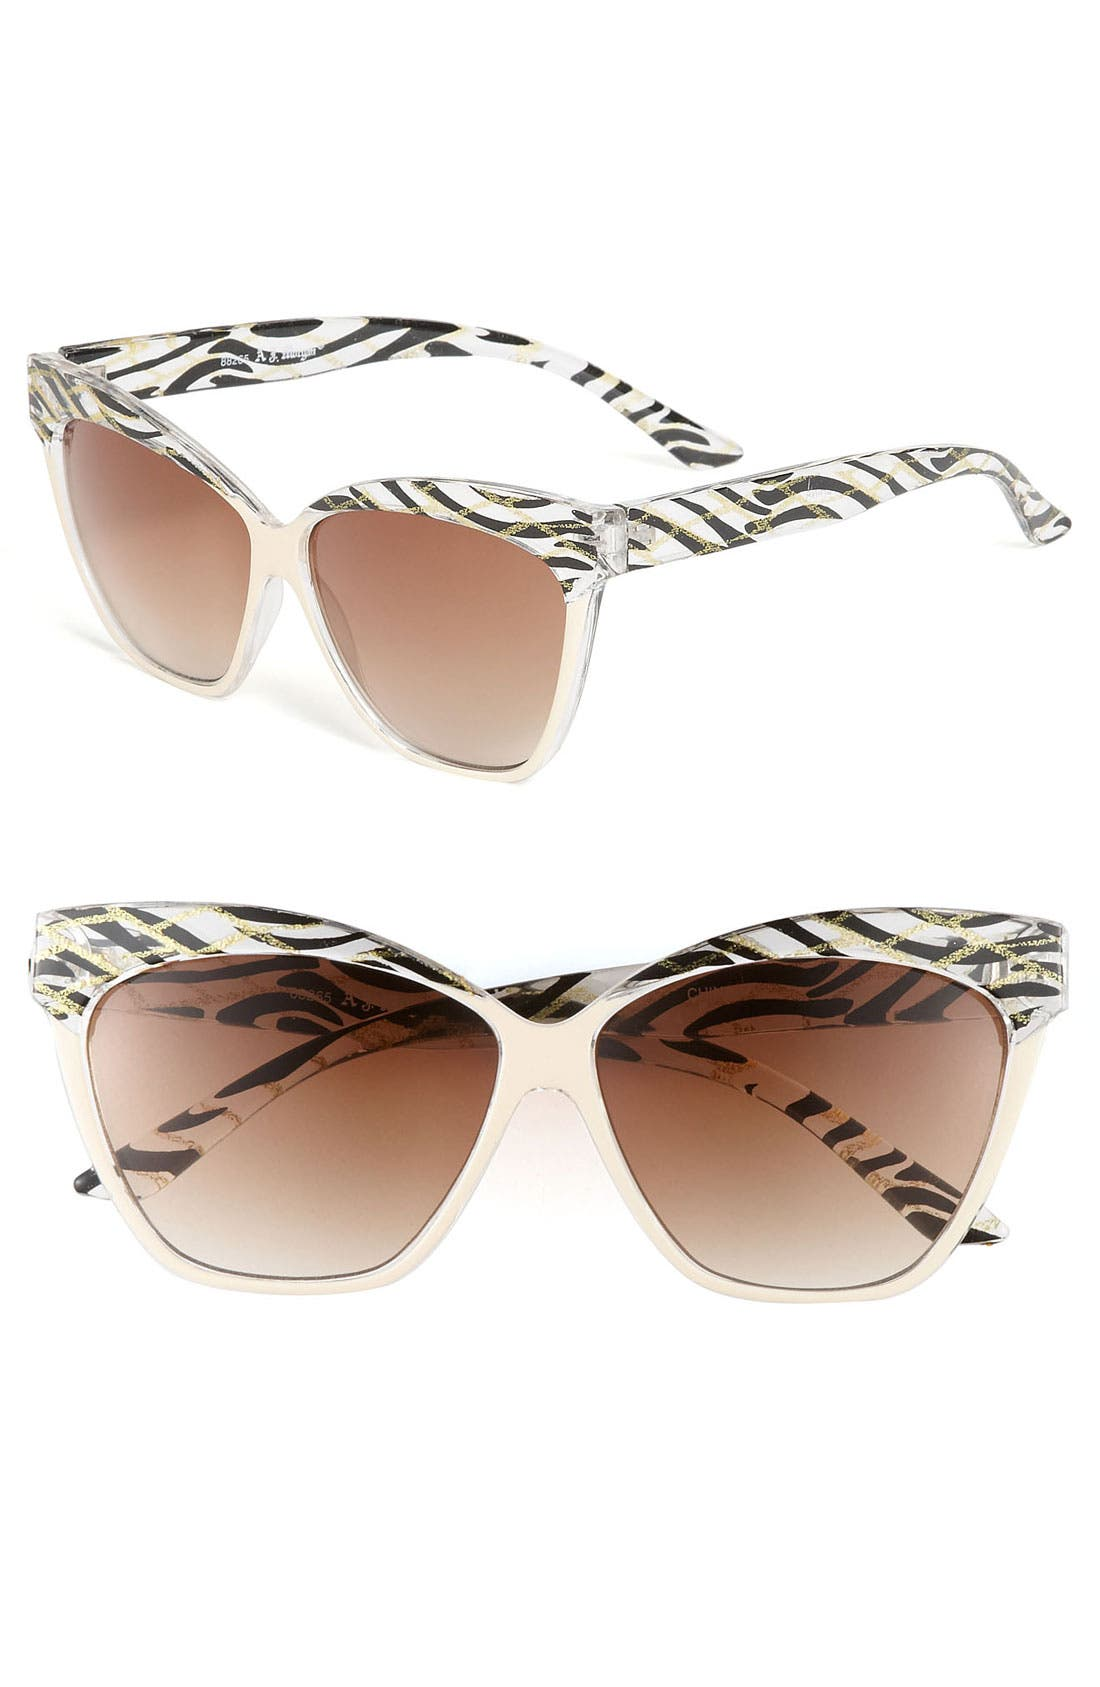 Alternate Image 1 Selected - A.J. Morgan 60mm 'Versailles' Sunglasses